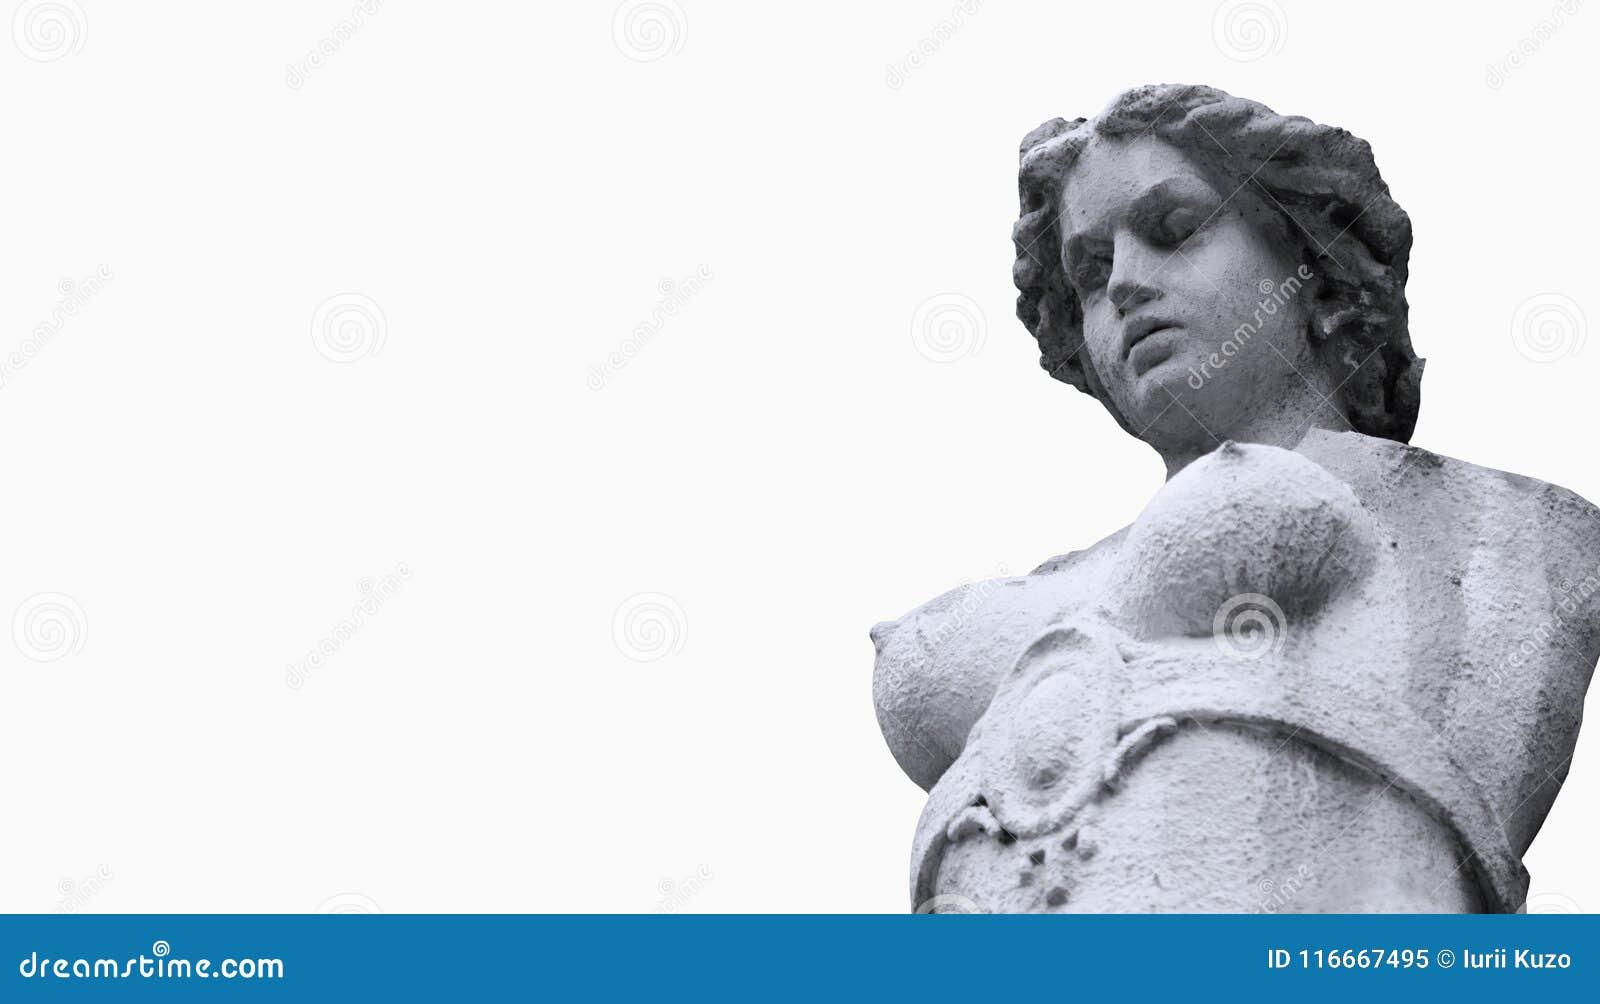 The Goddess Of Love In Greek Mythology Aphrodite Venus In